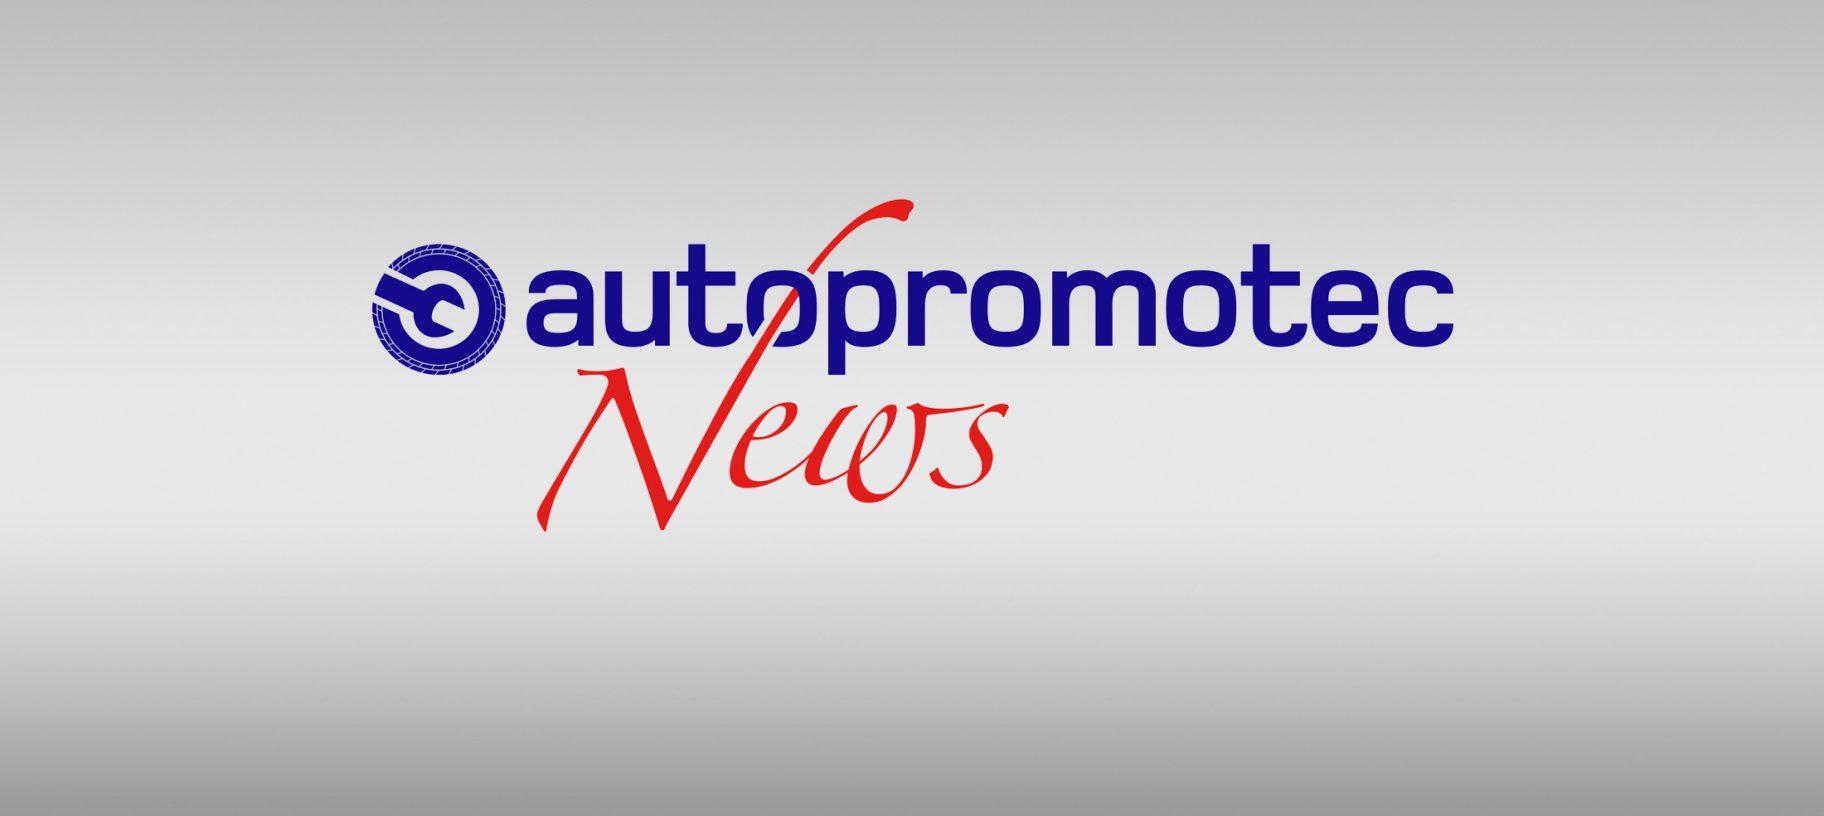 Autopromotec-news-logo-fiera